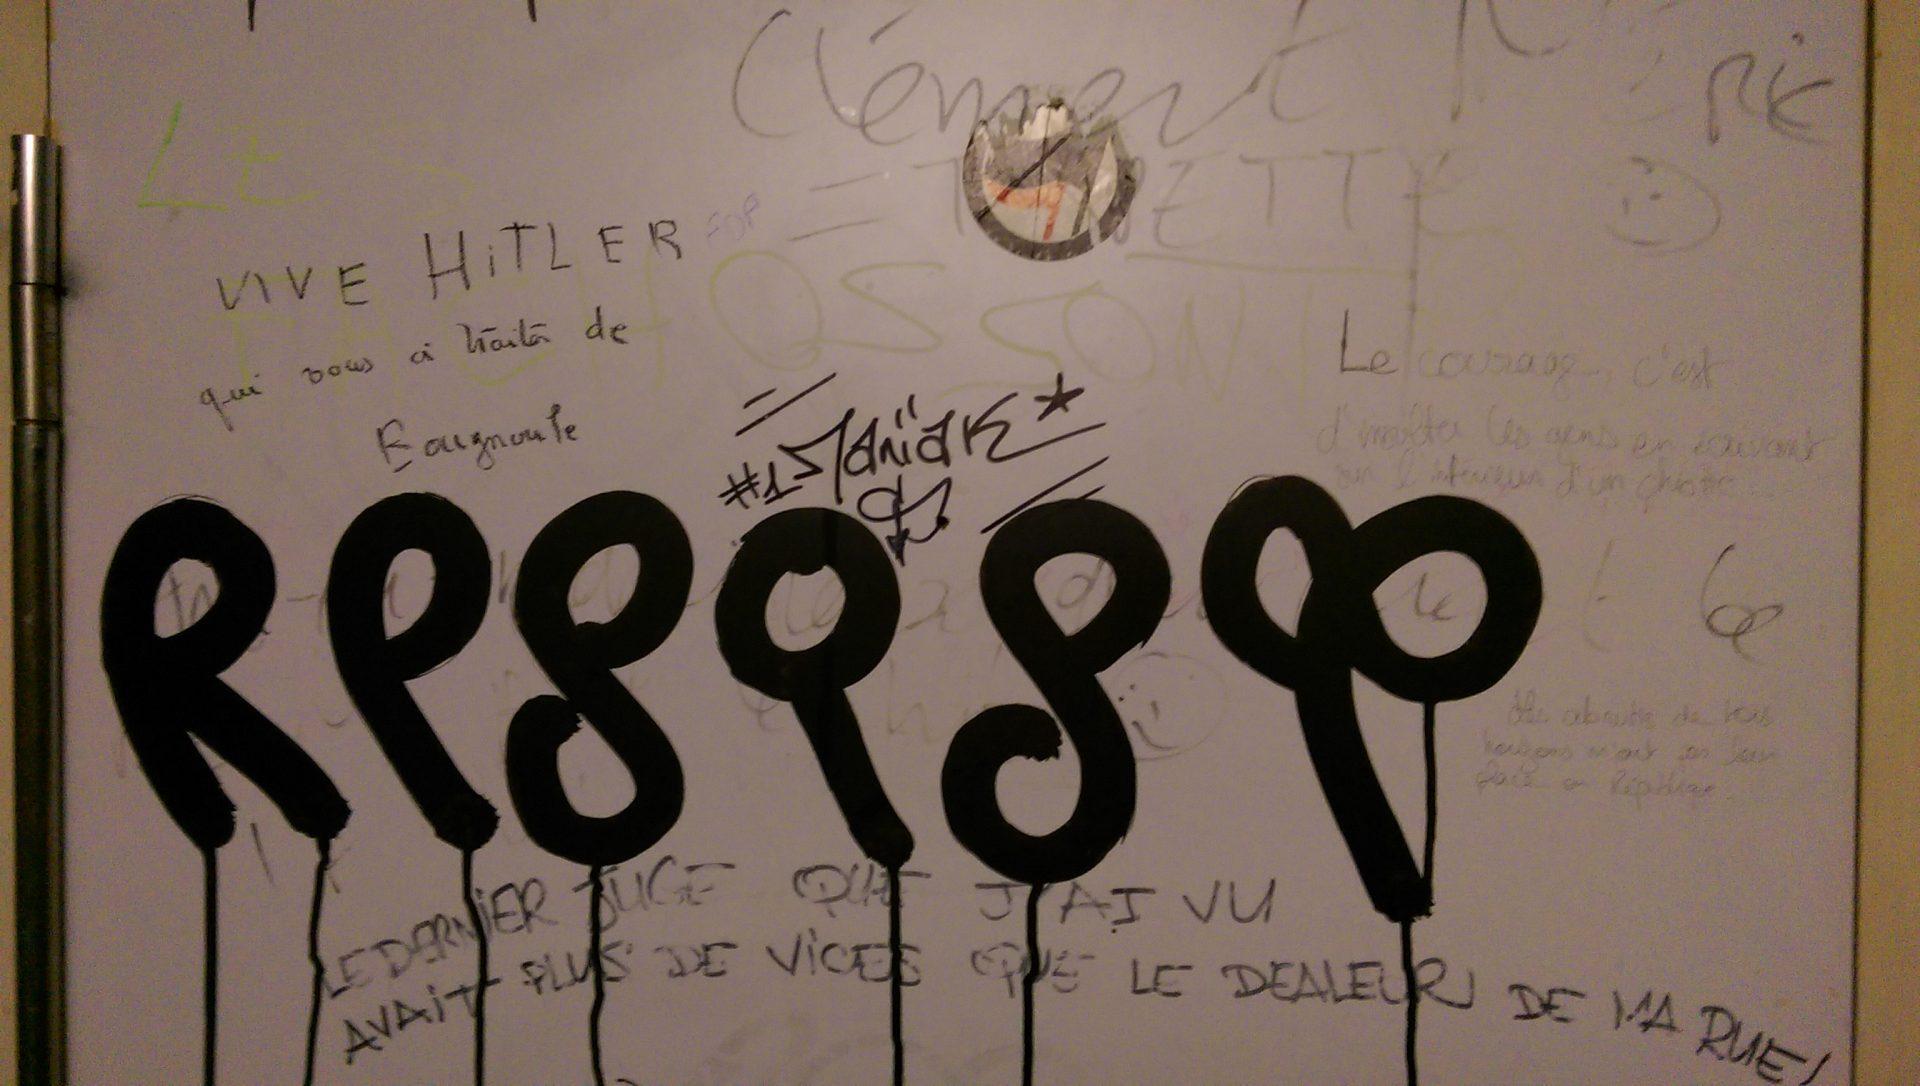 Des femmes et des hommes en robes noires - Crédit photo izart.fr